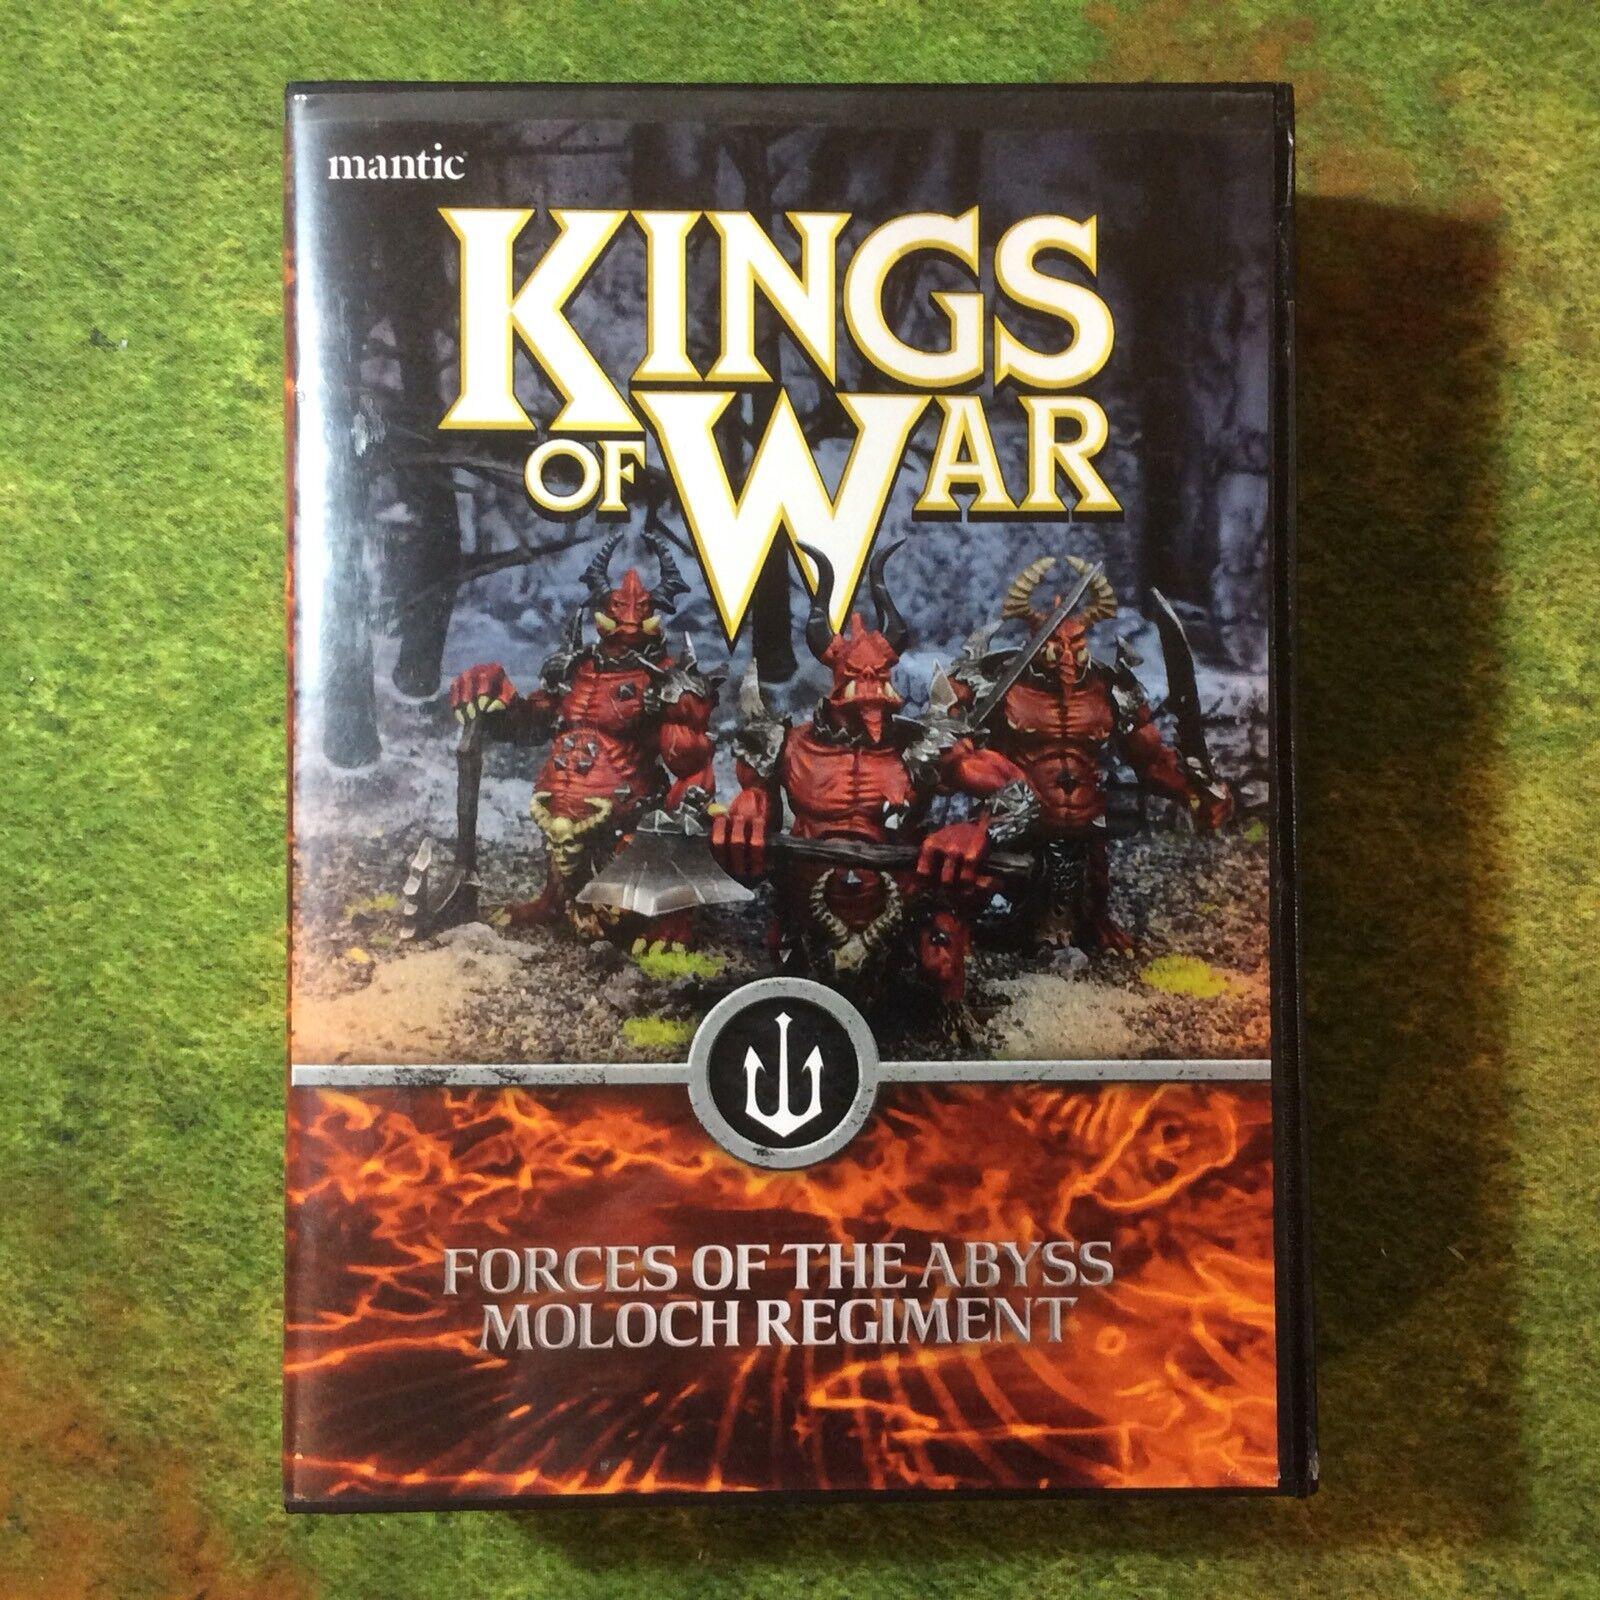 Mantic Games - Kings of War  Moloch Regiment